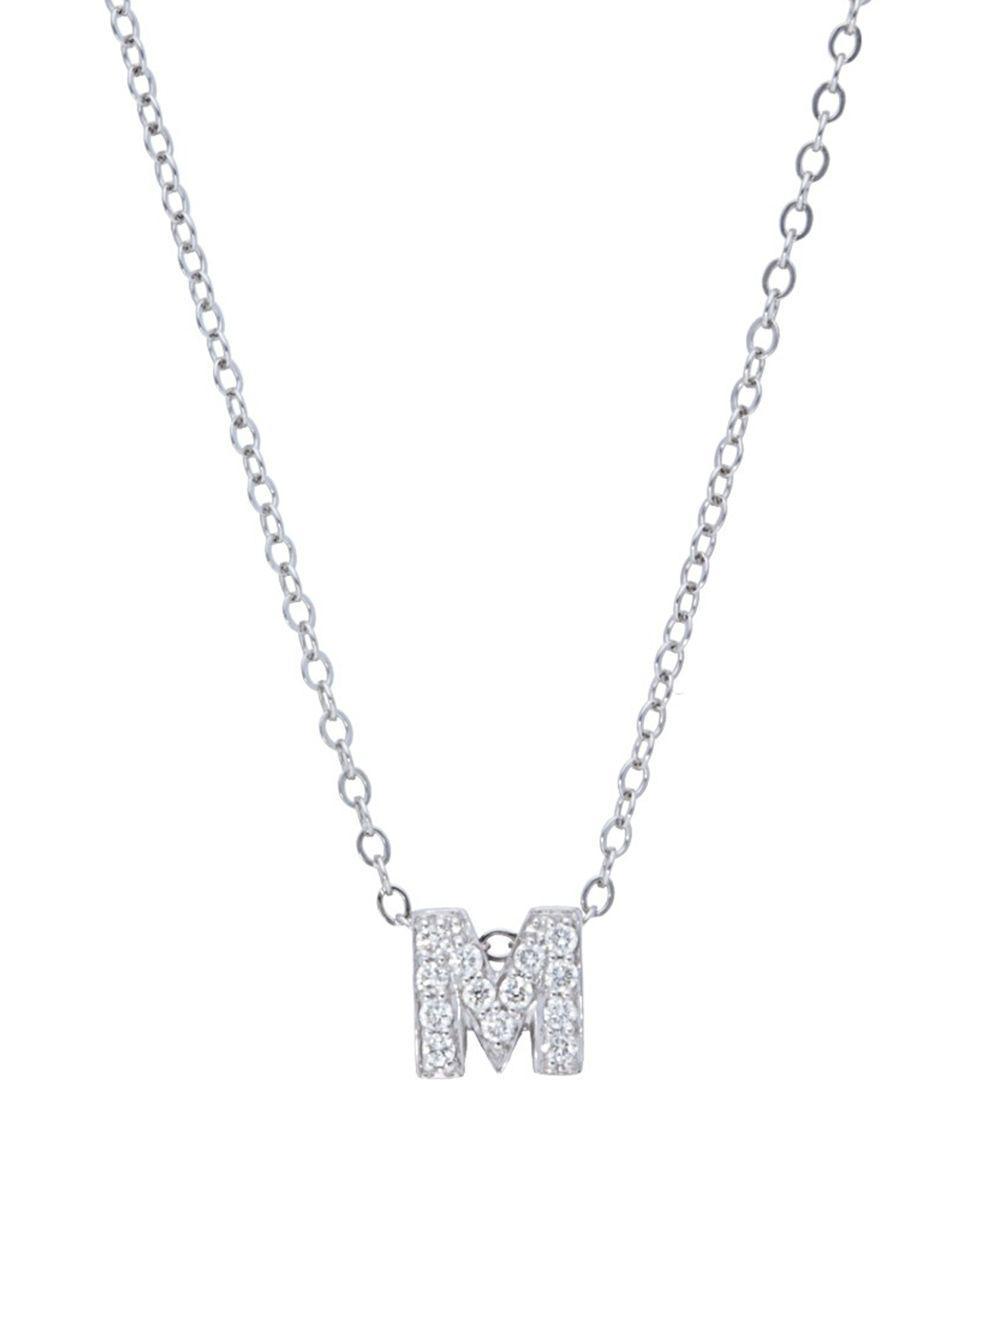 Lyst nephora diamond 14k white gold initial pendant necklace in nephora womens metallic diamond 14k white gold initial pendant necklace aloadofball Gallery